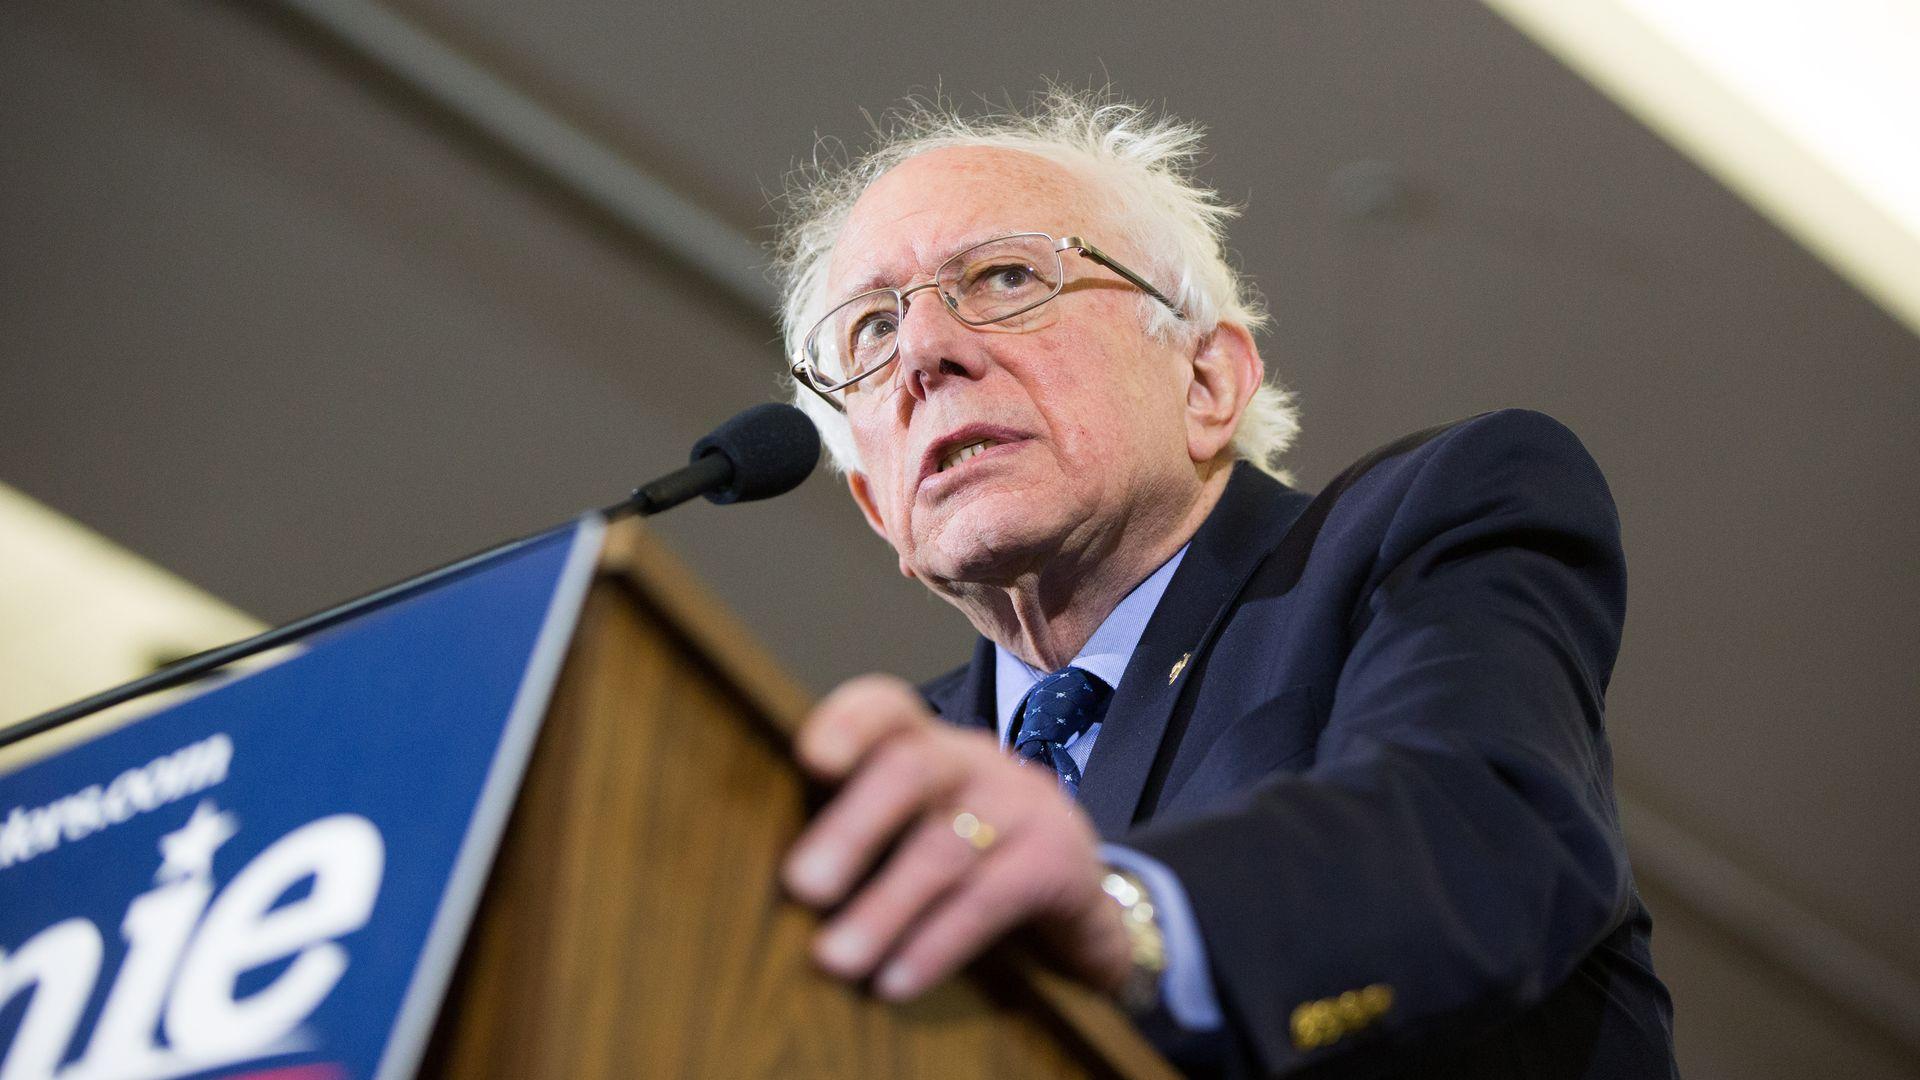 Bernie Sanders: U.S. must follow New Zealand's lead and ban assault weapons